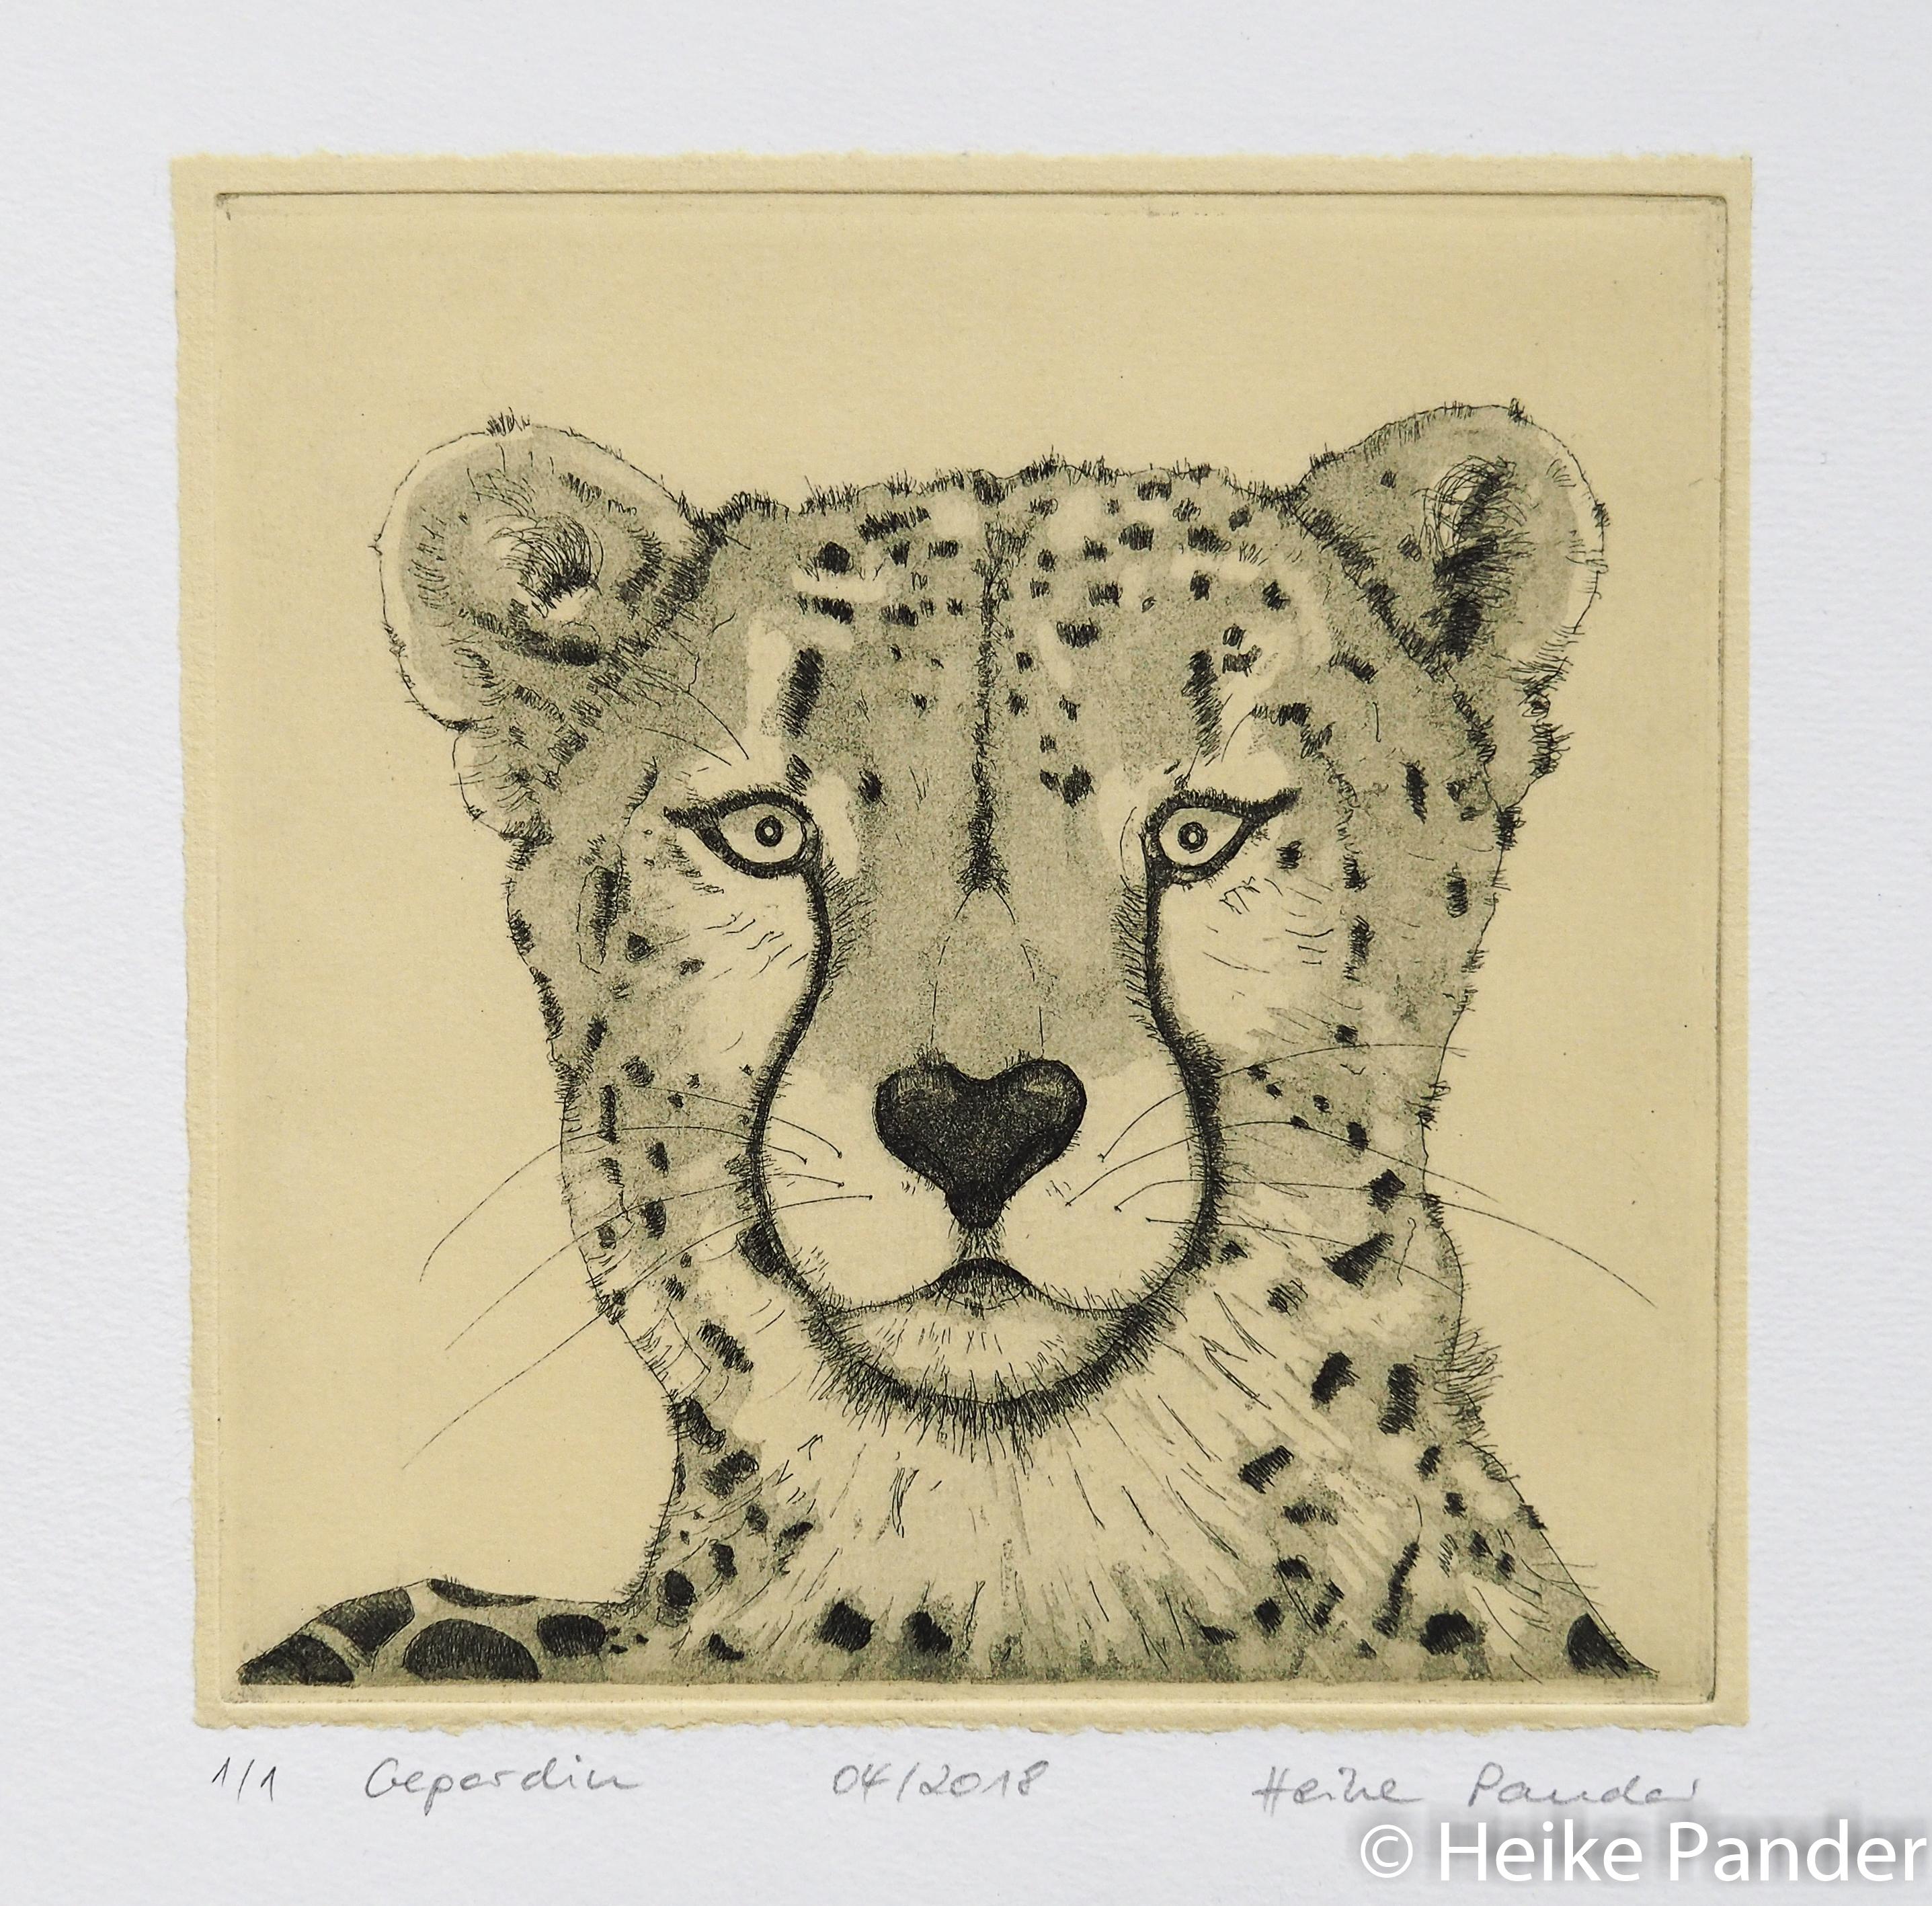 Gepardin, Radierung, Heike Pander